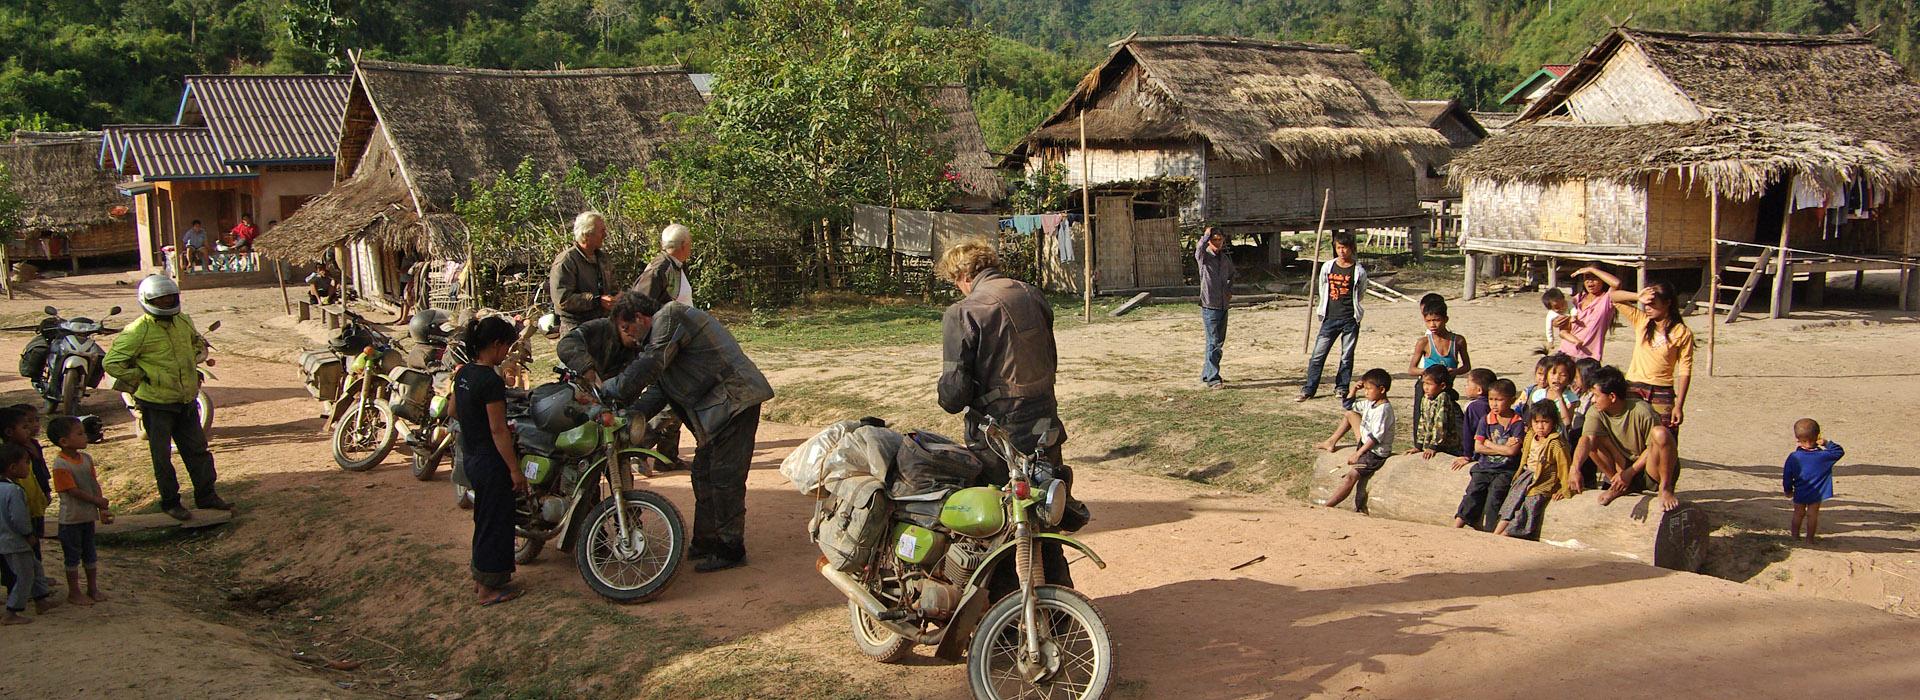 Motorreis Laos en Vietnam, reisduur 22 dagen, Travel 2 Explore Motorreizen